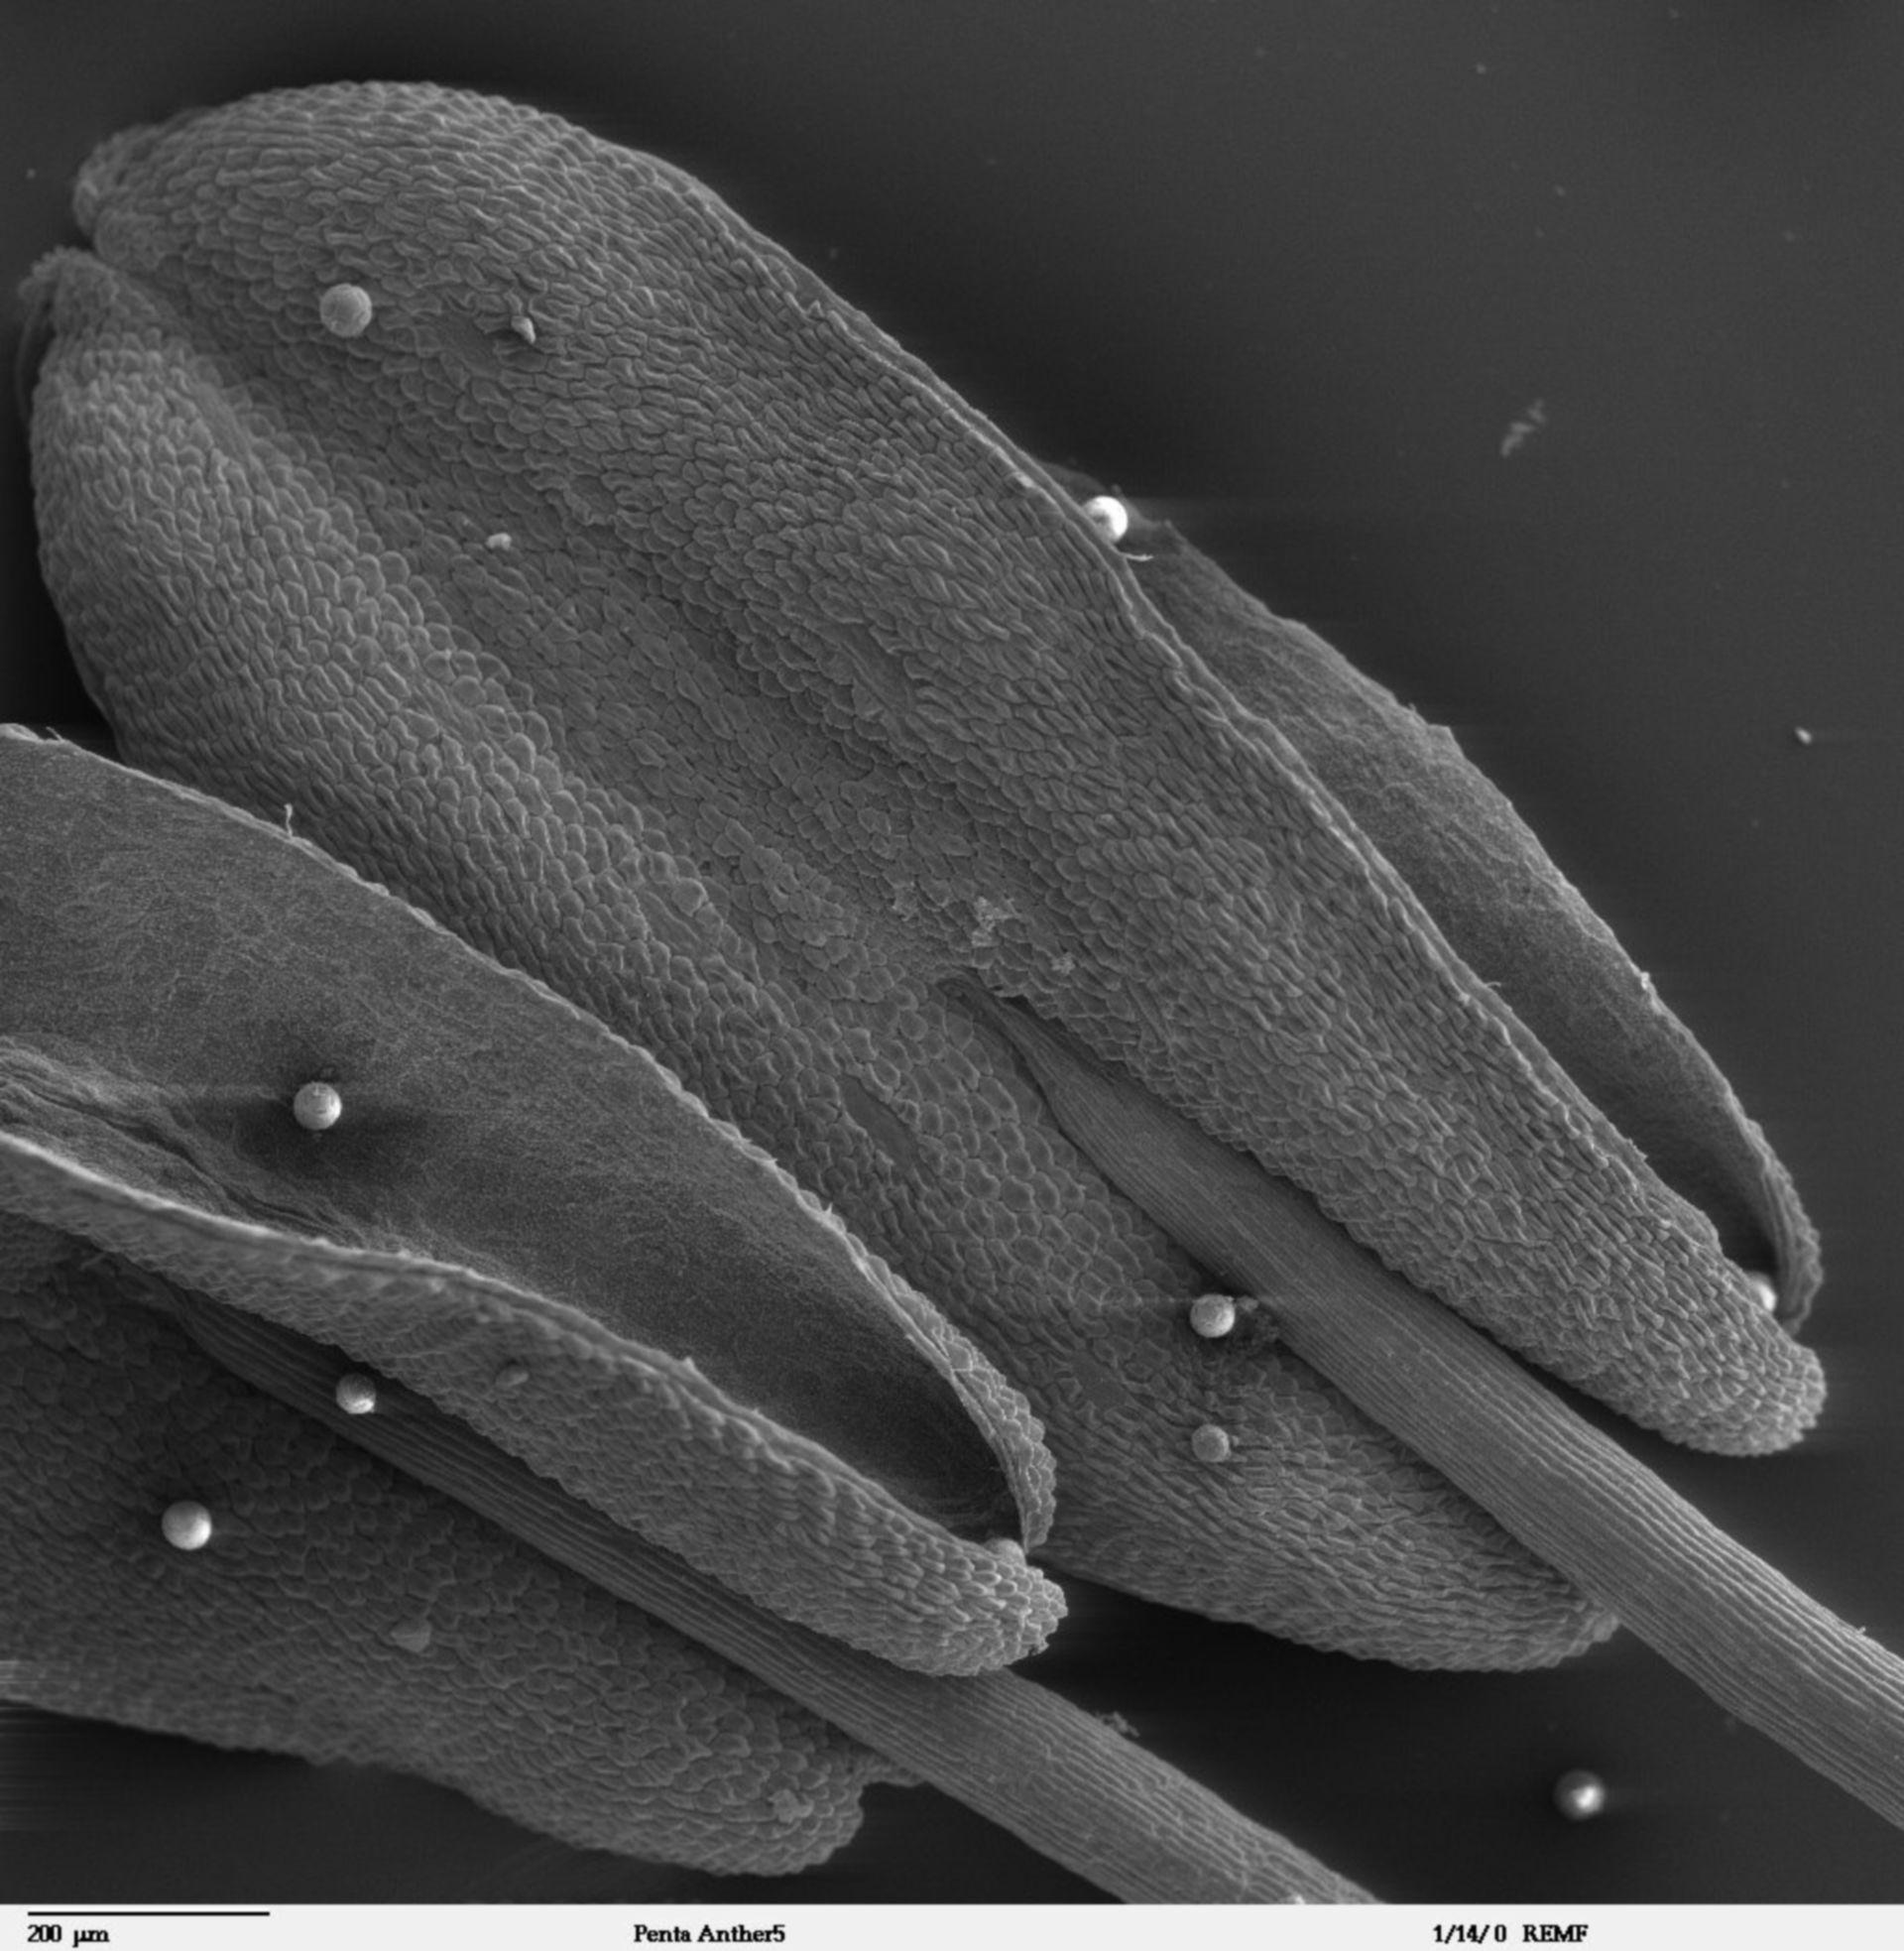 Pentas lanceolata - CIL:41310